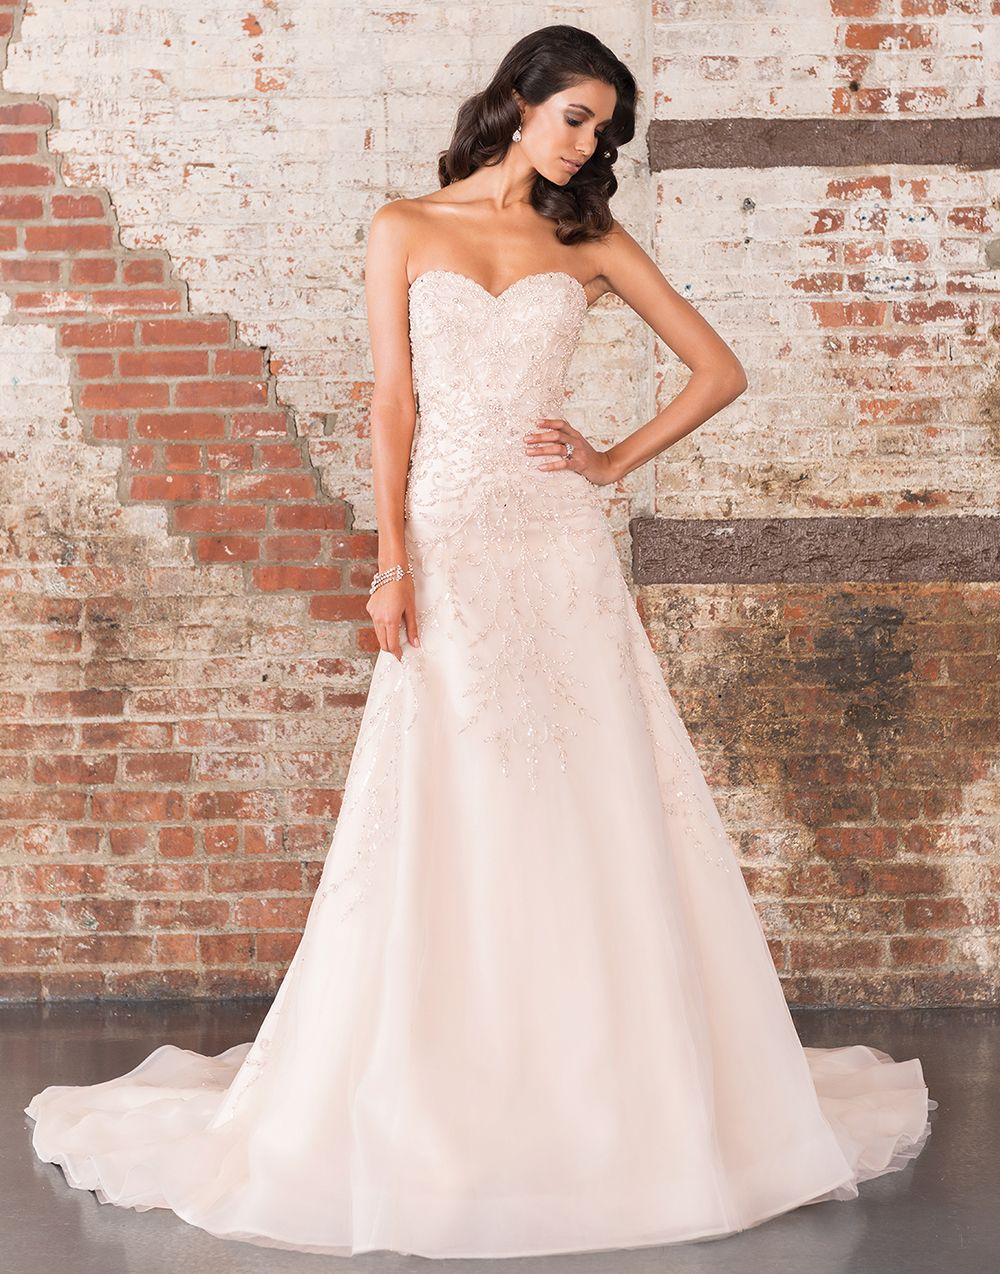 Justin alexander signature wedding dresses style some ideas